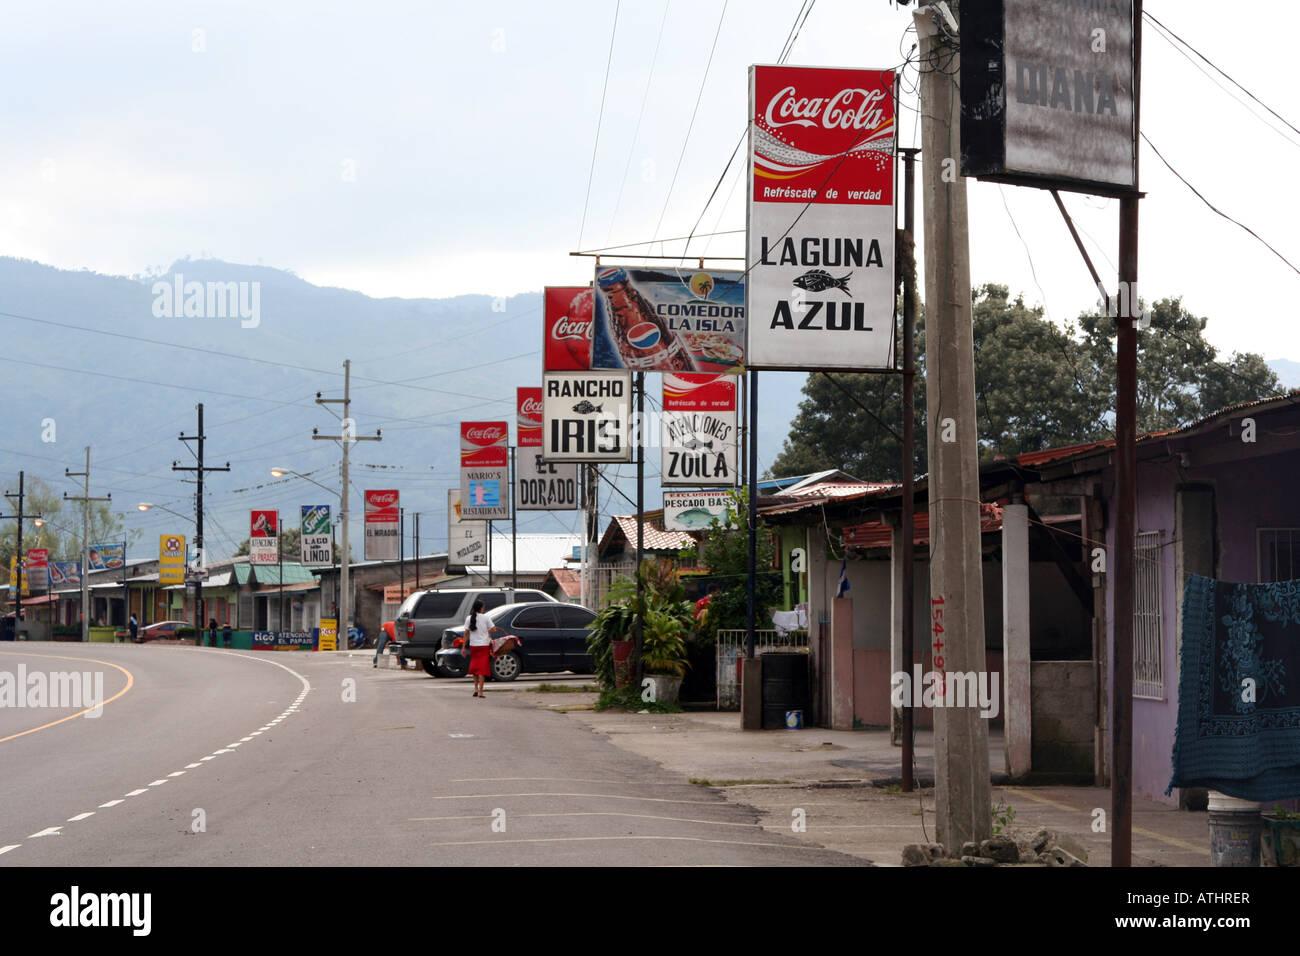 Dozens of small seafood restaurants line the highway on the eastern shore of Lago de Yojoa, Honduras. Stock Photo